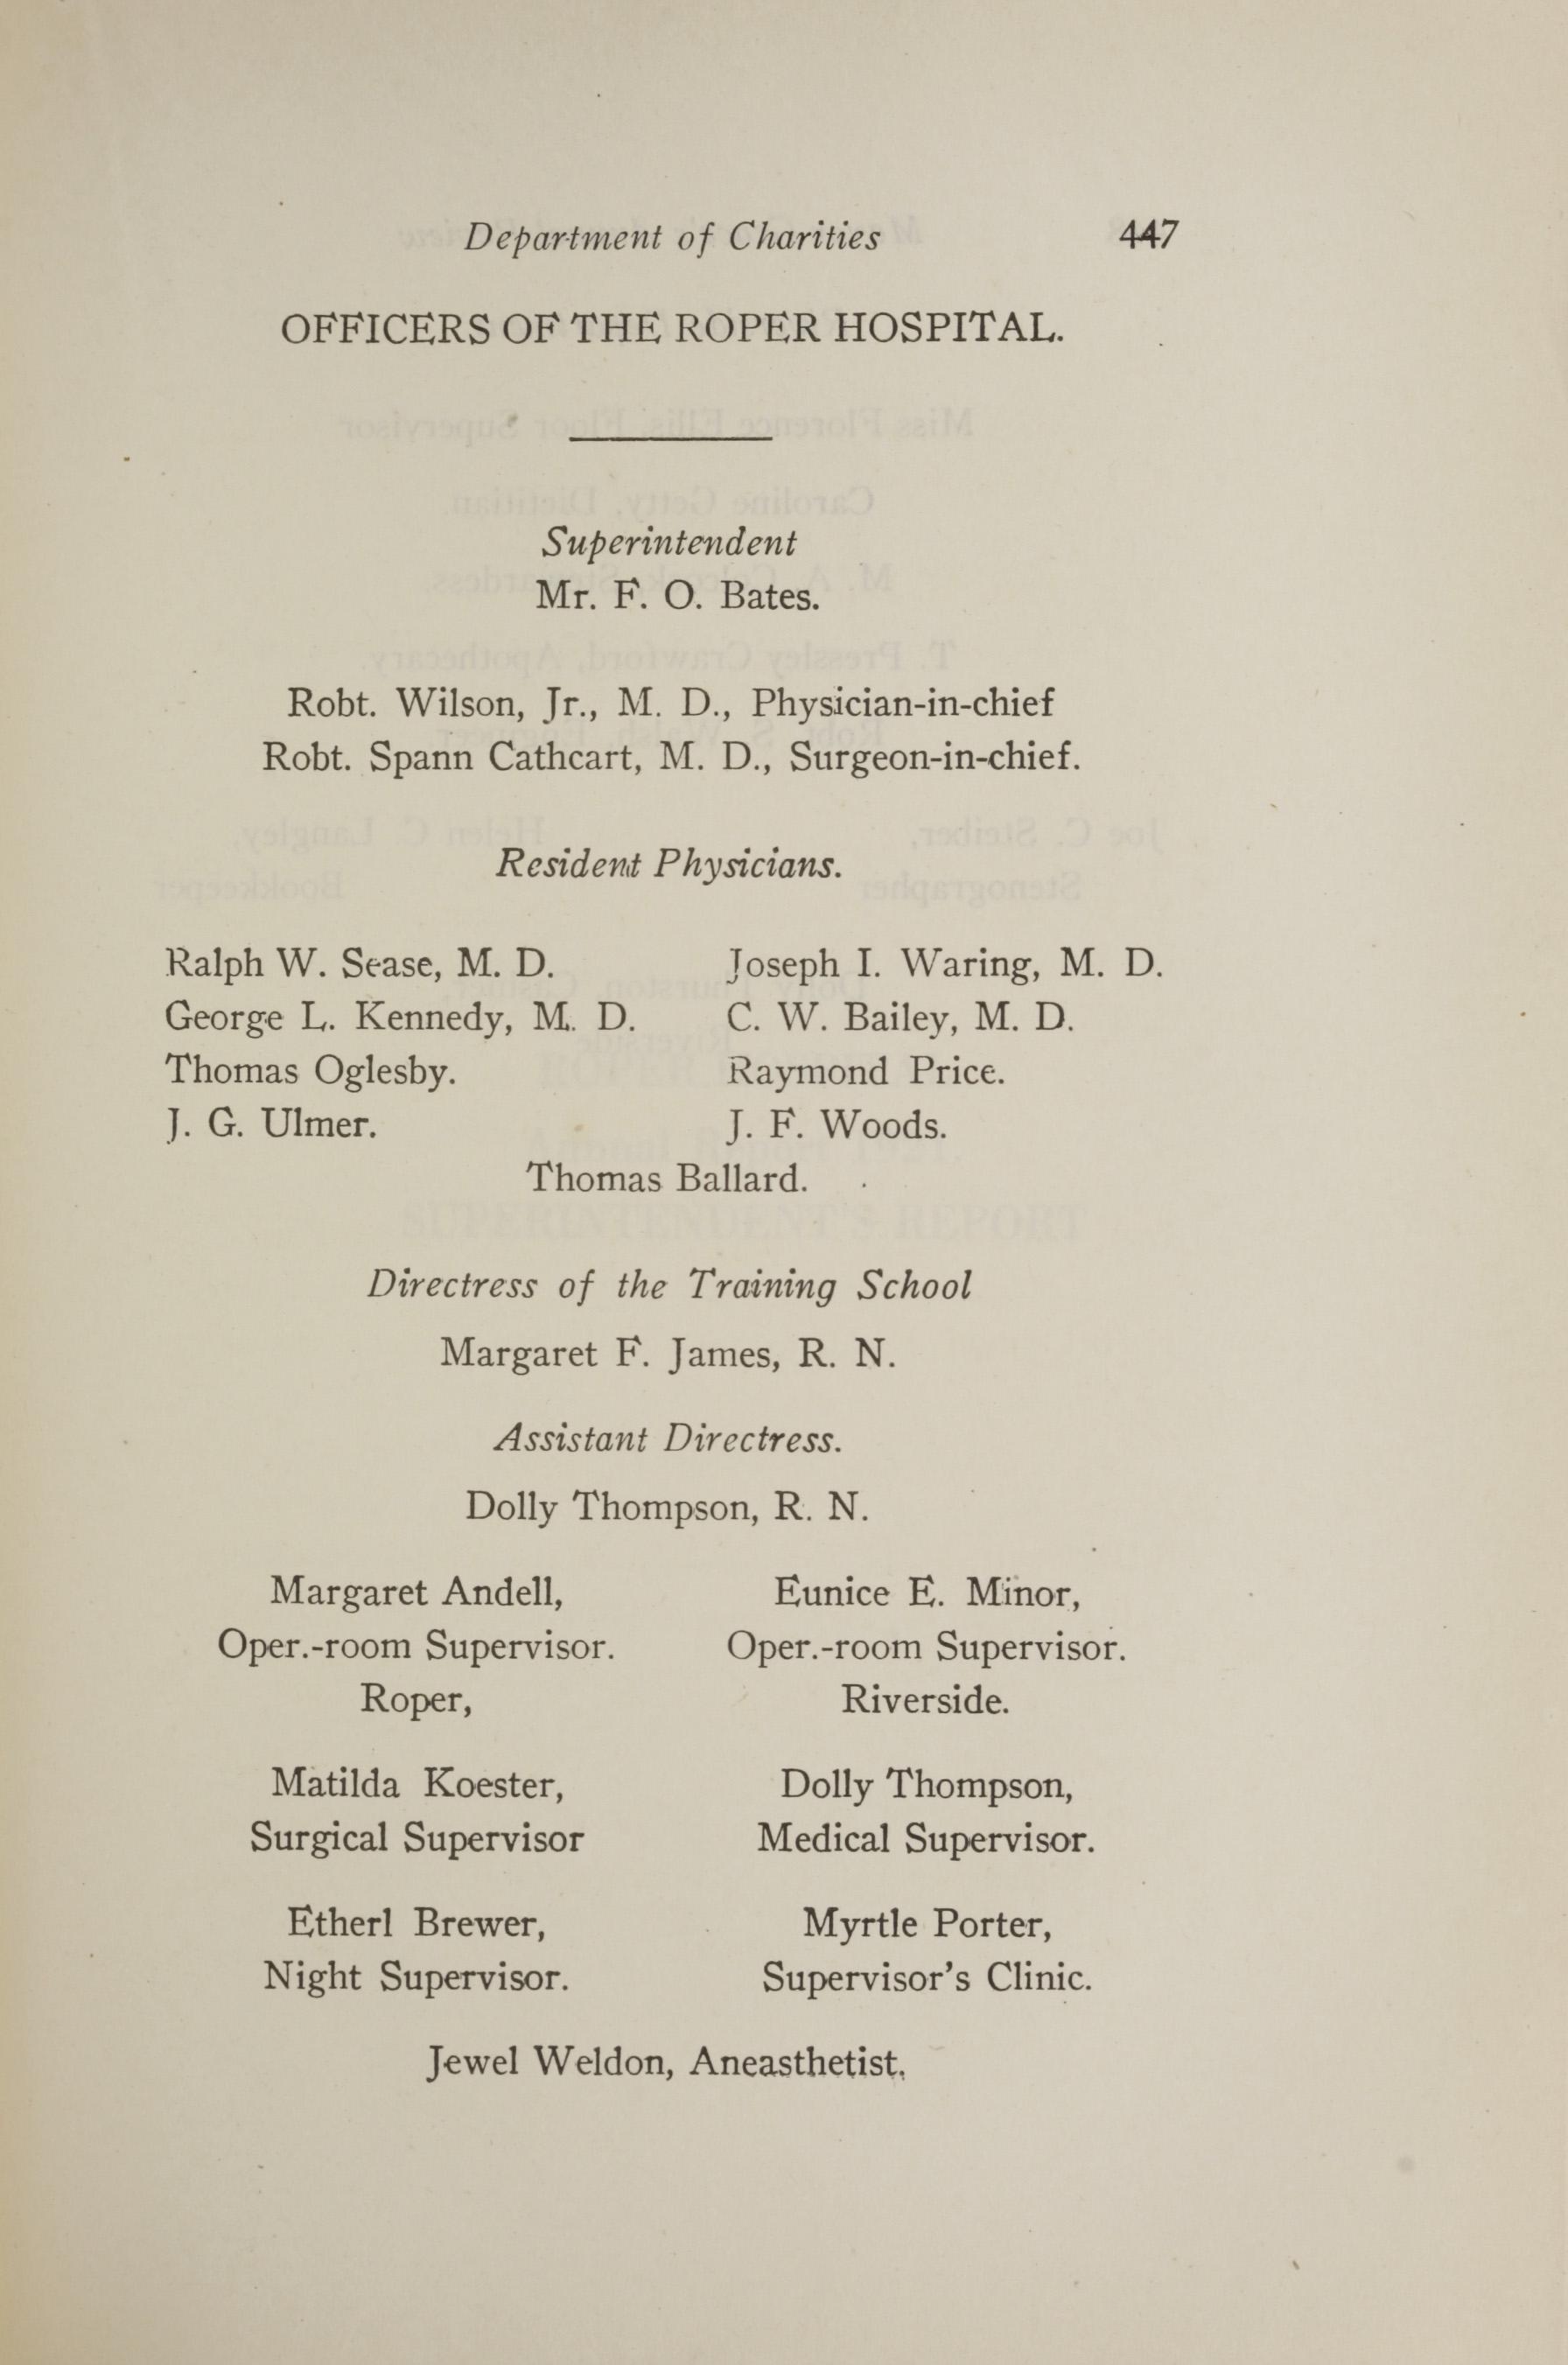 Charleston Yearbook, 1921, page 447